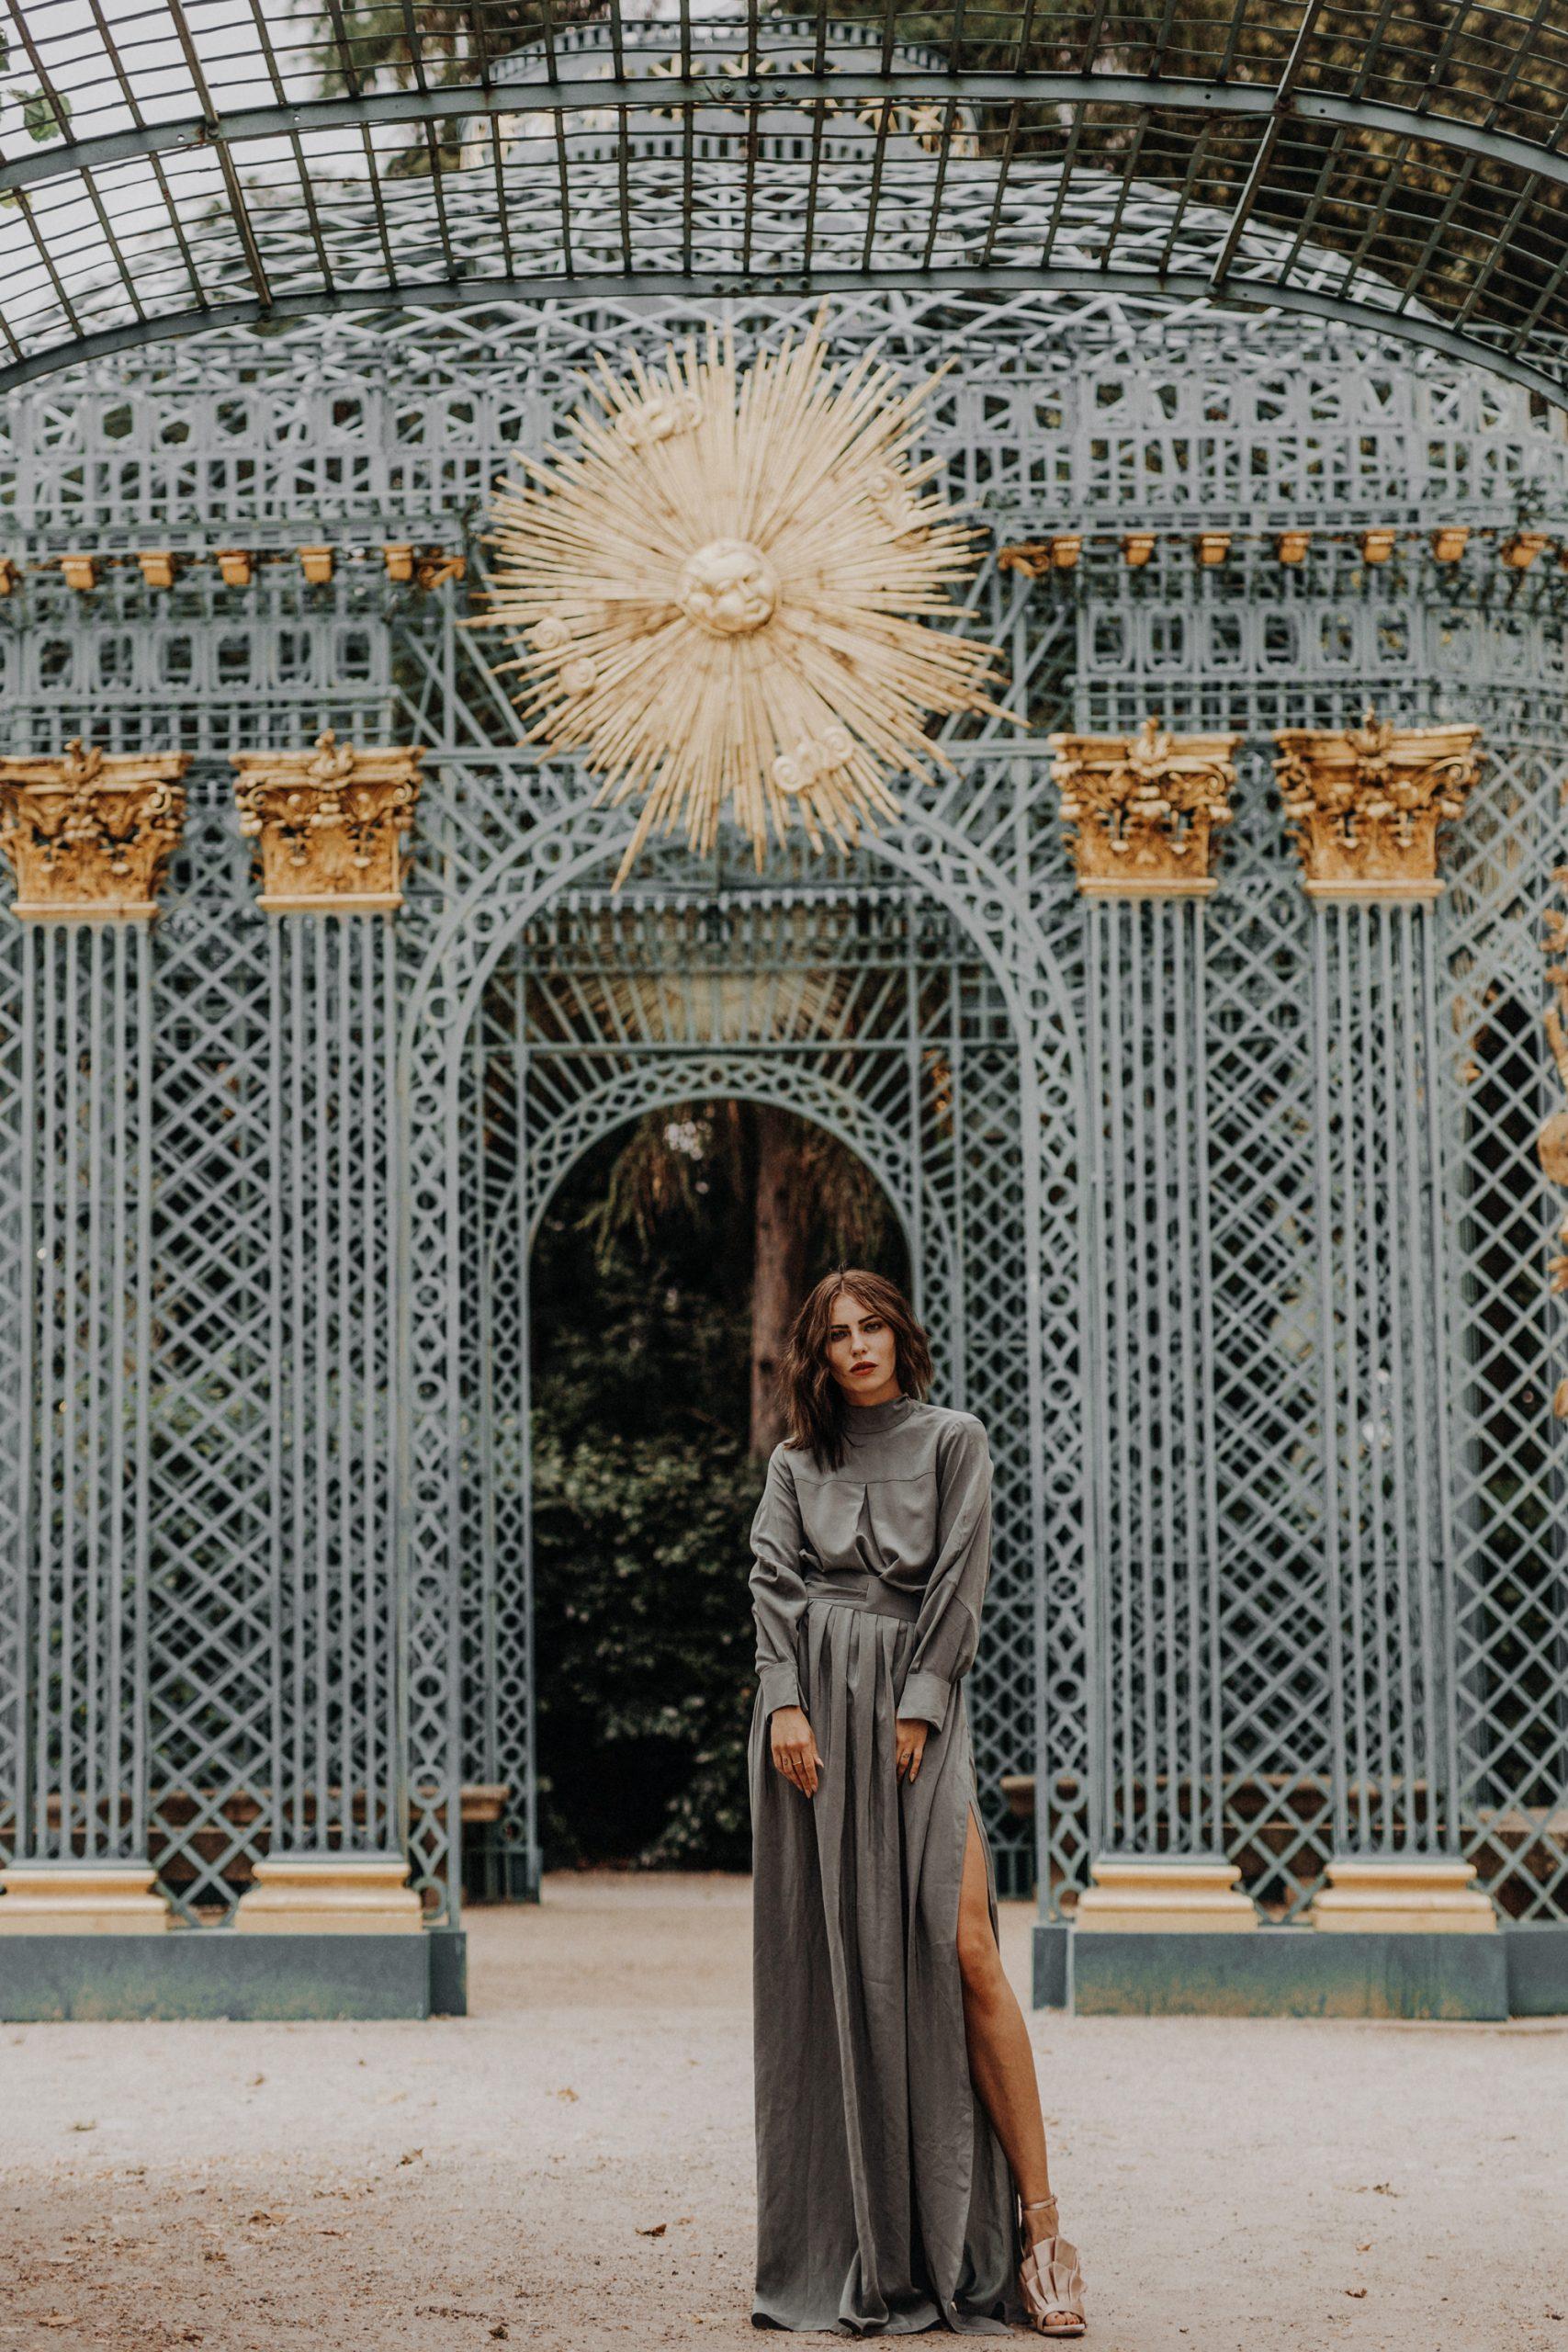 15 Luxurius Abend Dress Fashion Spezialgebiet Coolste Abend Dress Fashion Vertrieb